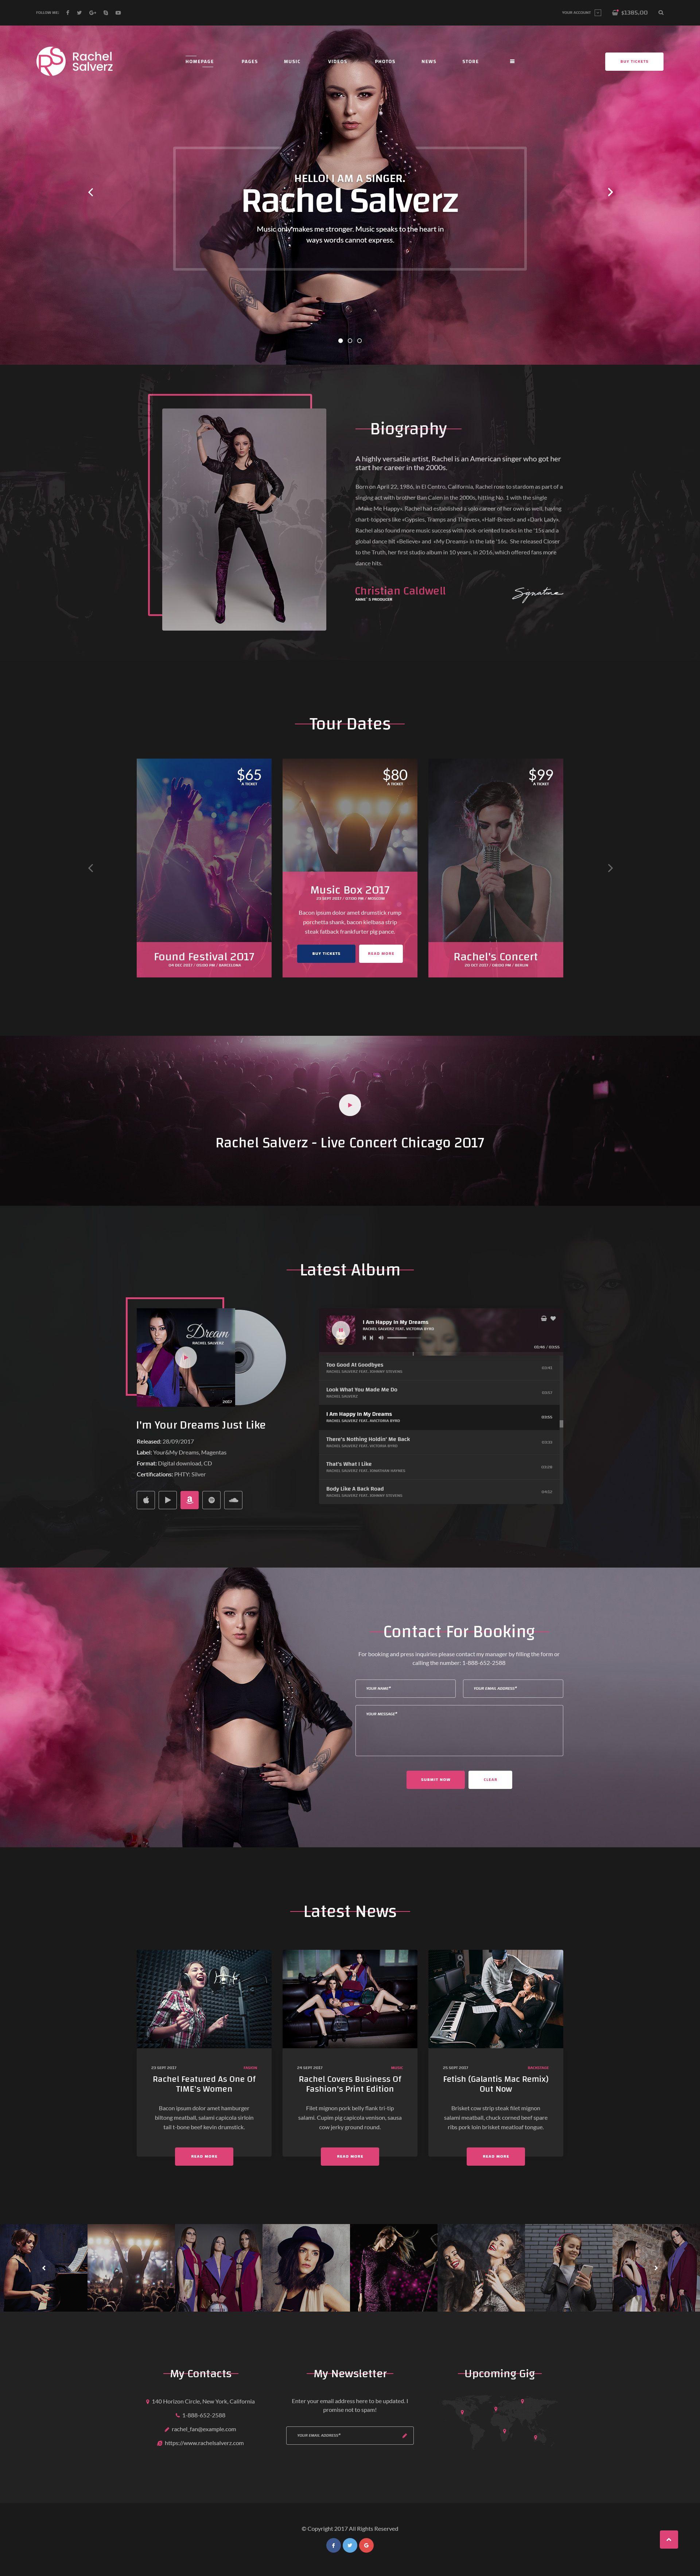 Singer Music Psd Template Musician Website Website Design Layout Mobile Web Design